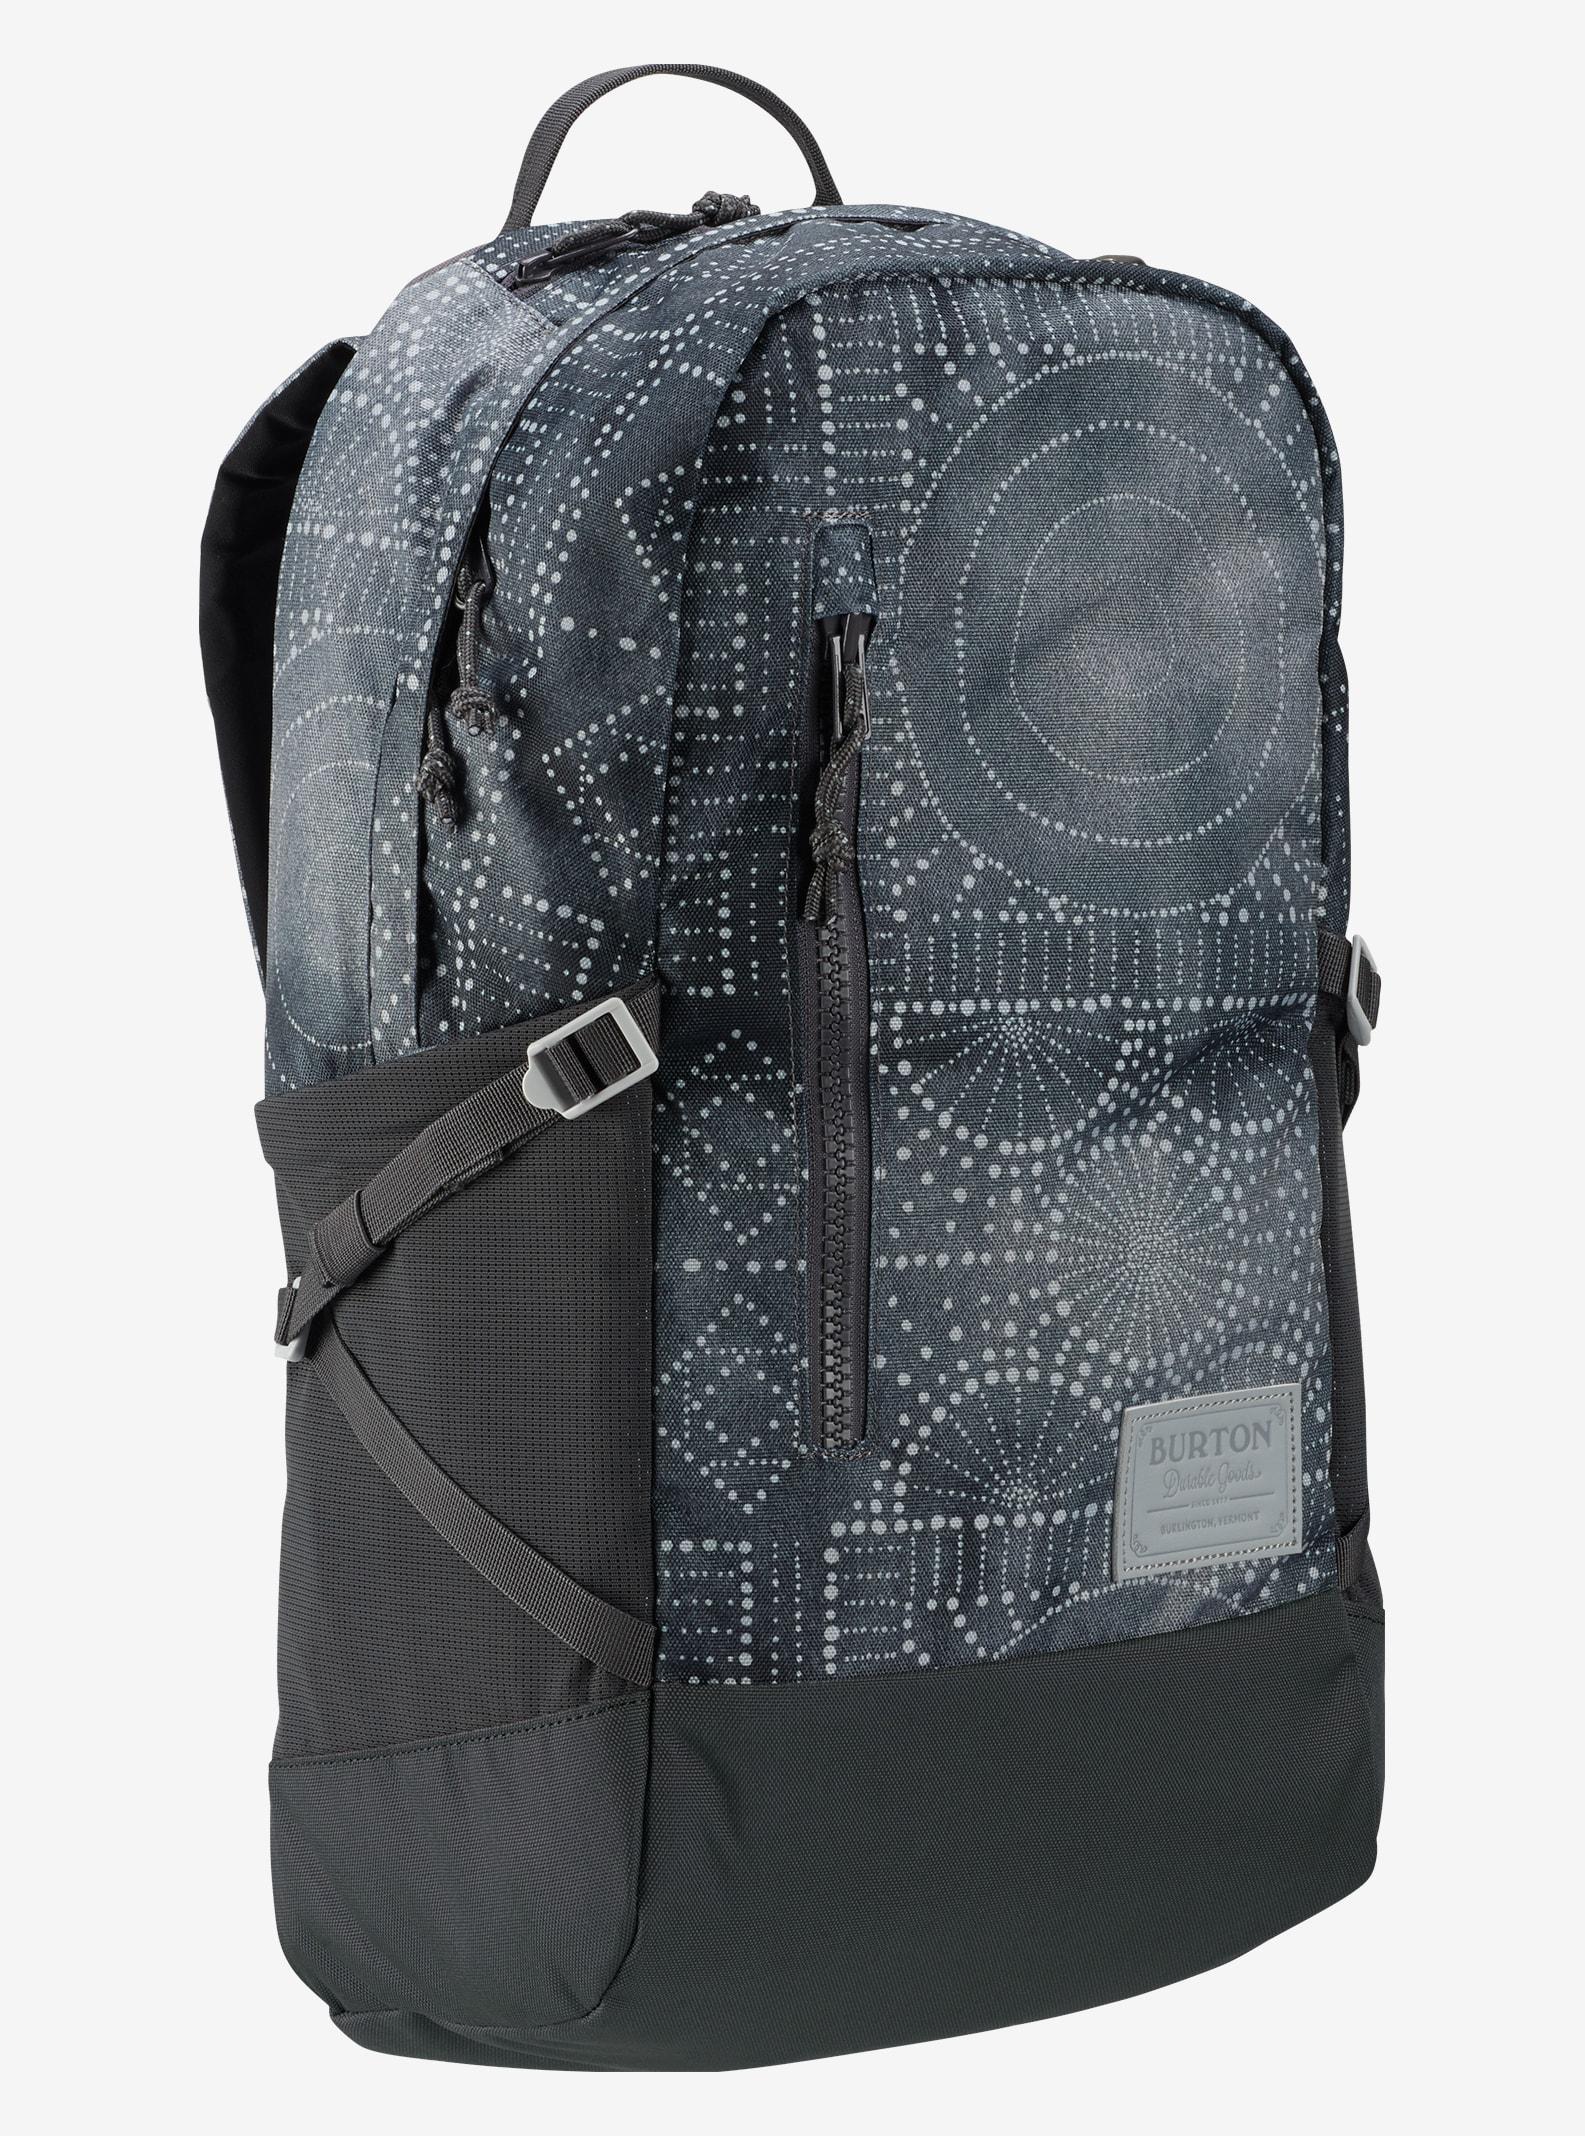 Burton Women's Prospect Backpack shown in Bandotta Print